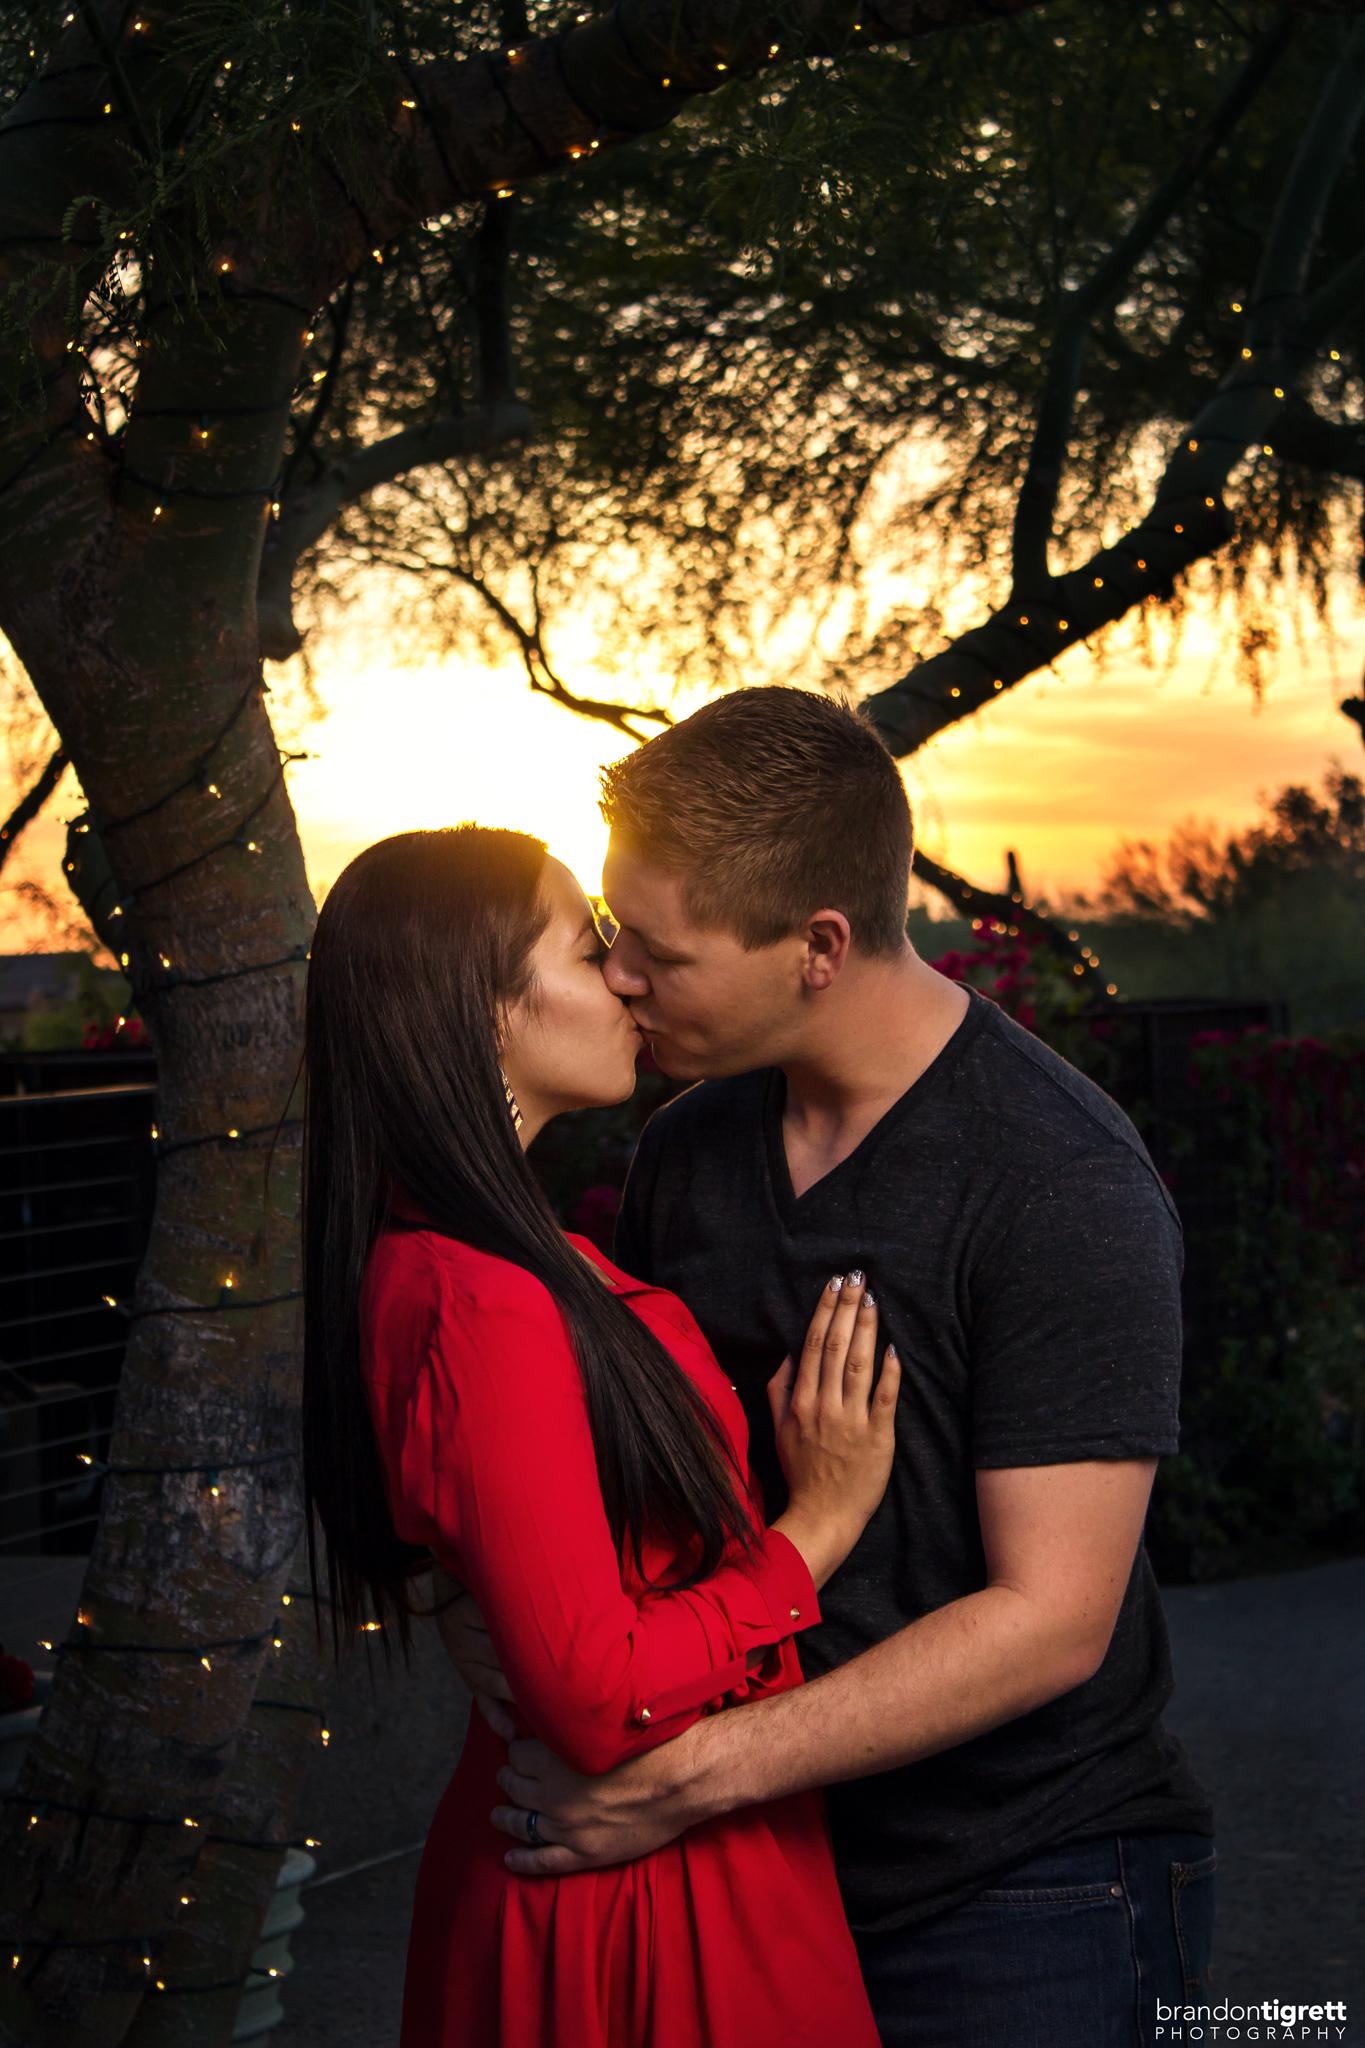 2014_Brandon-Tigrett_Scottsdale_couple_Caraline-Jackson-117_WEB.jpg